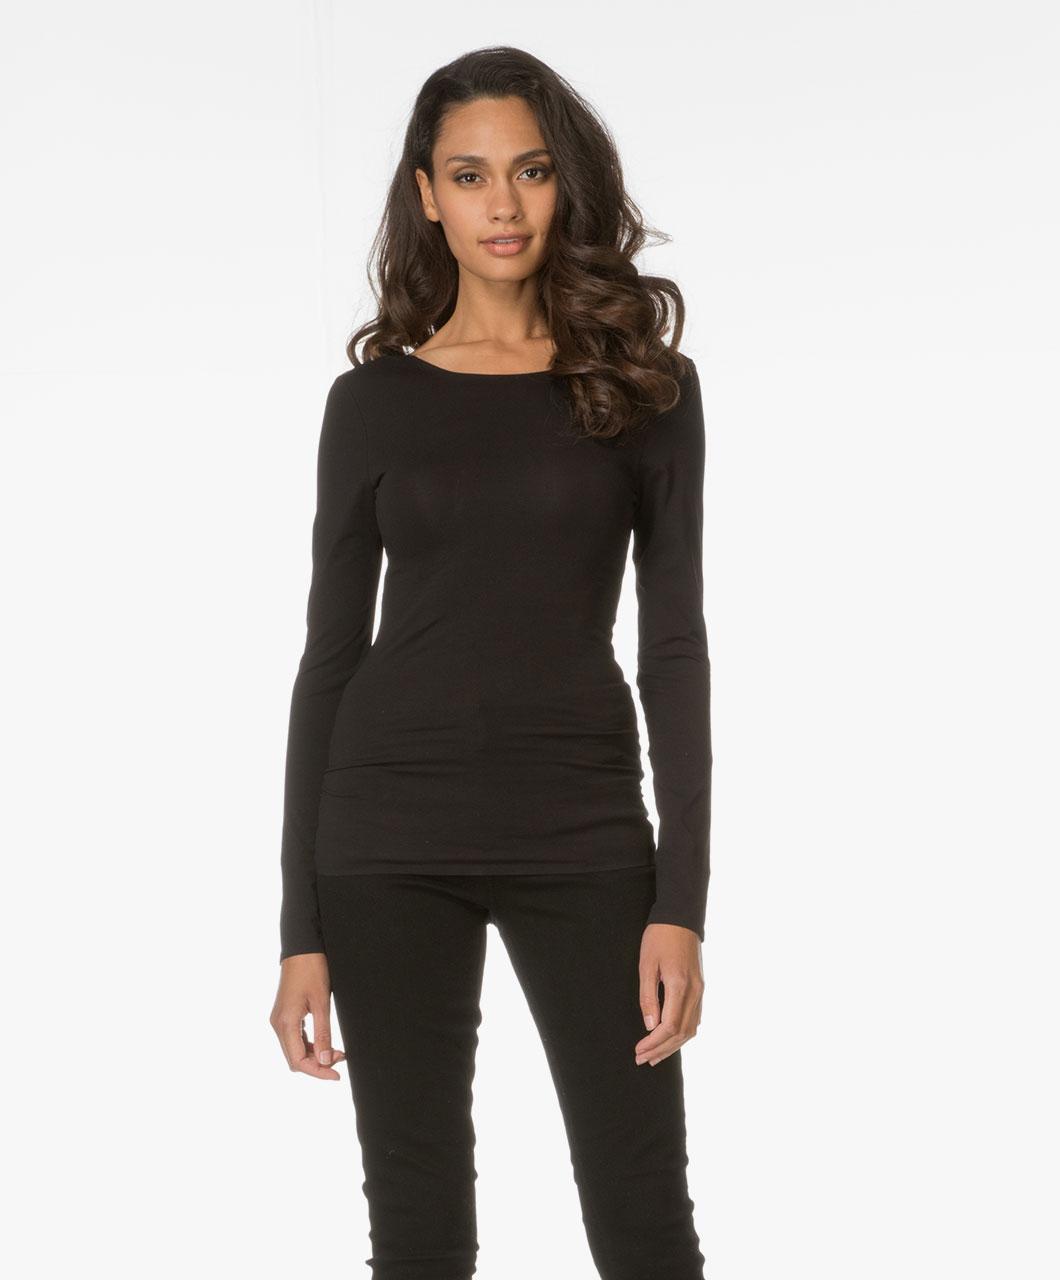 drykorn arina low back t shirt black arina 507100 1000. Black Bedroom Furniture Sets. Home Design Ideas